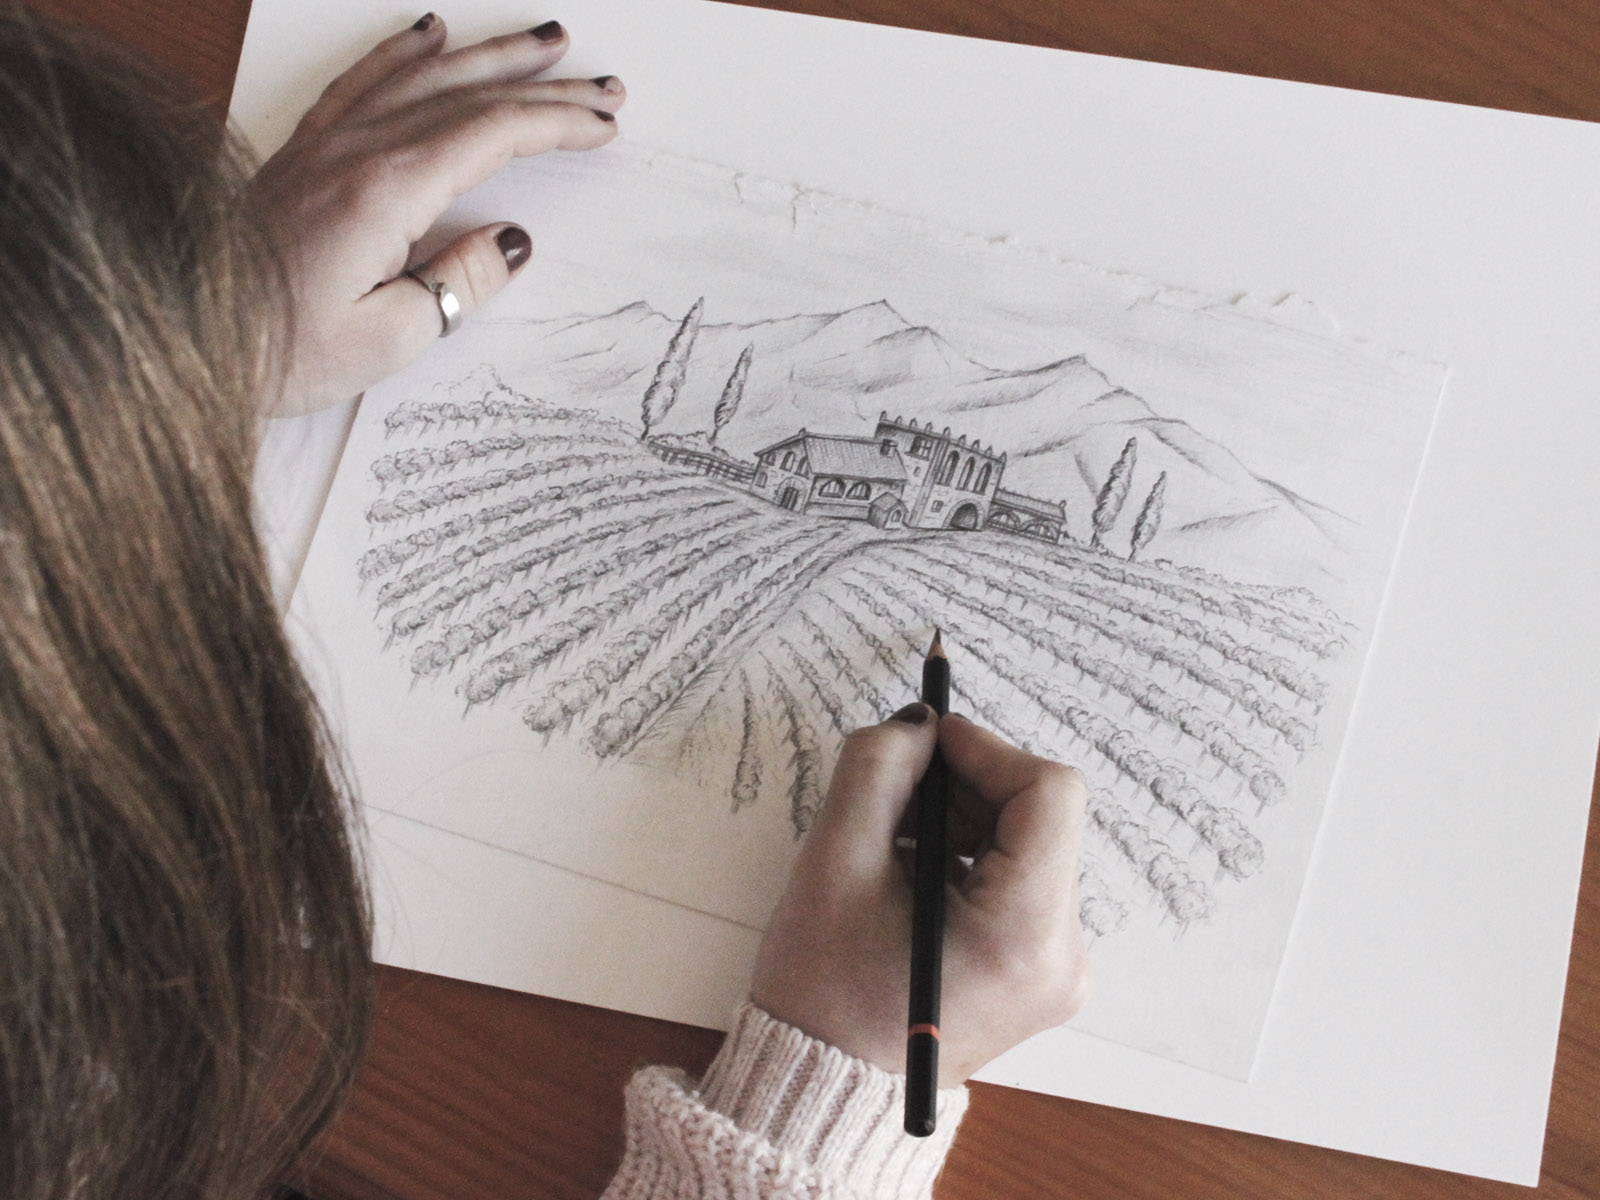 Ilustración hecha a mano, dibujo a carboncillo, diseño de etiqueta para vino